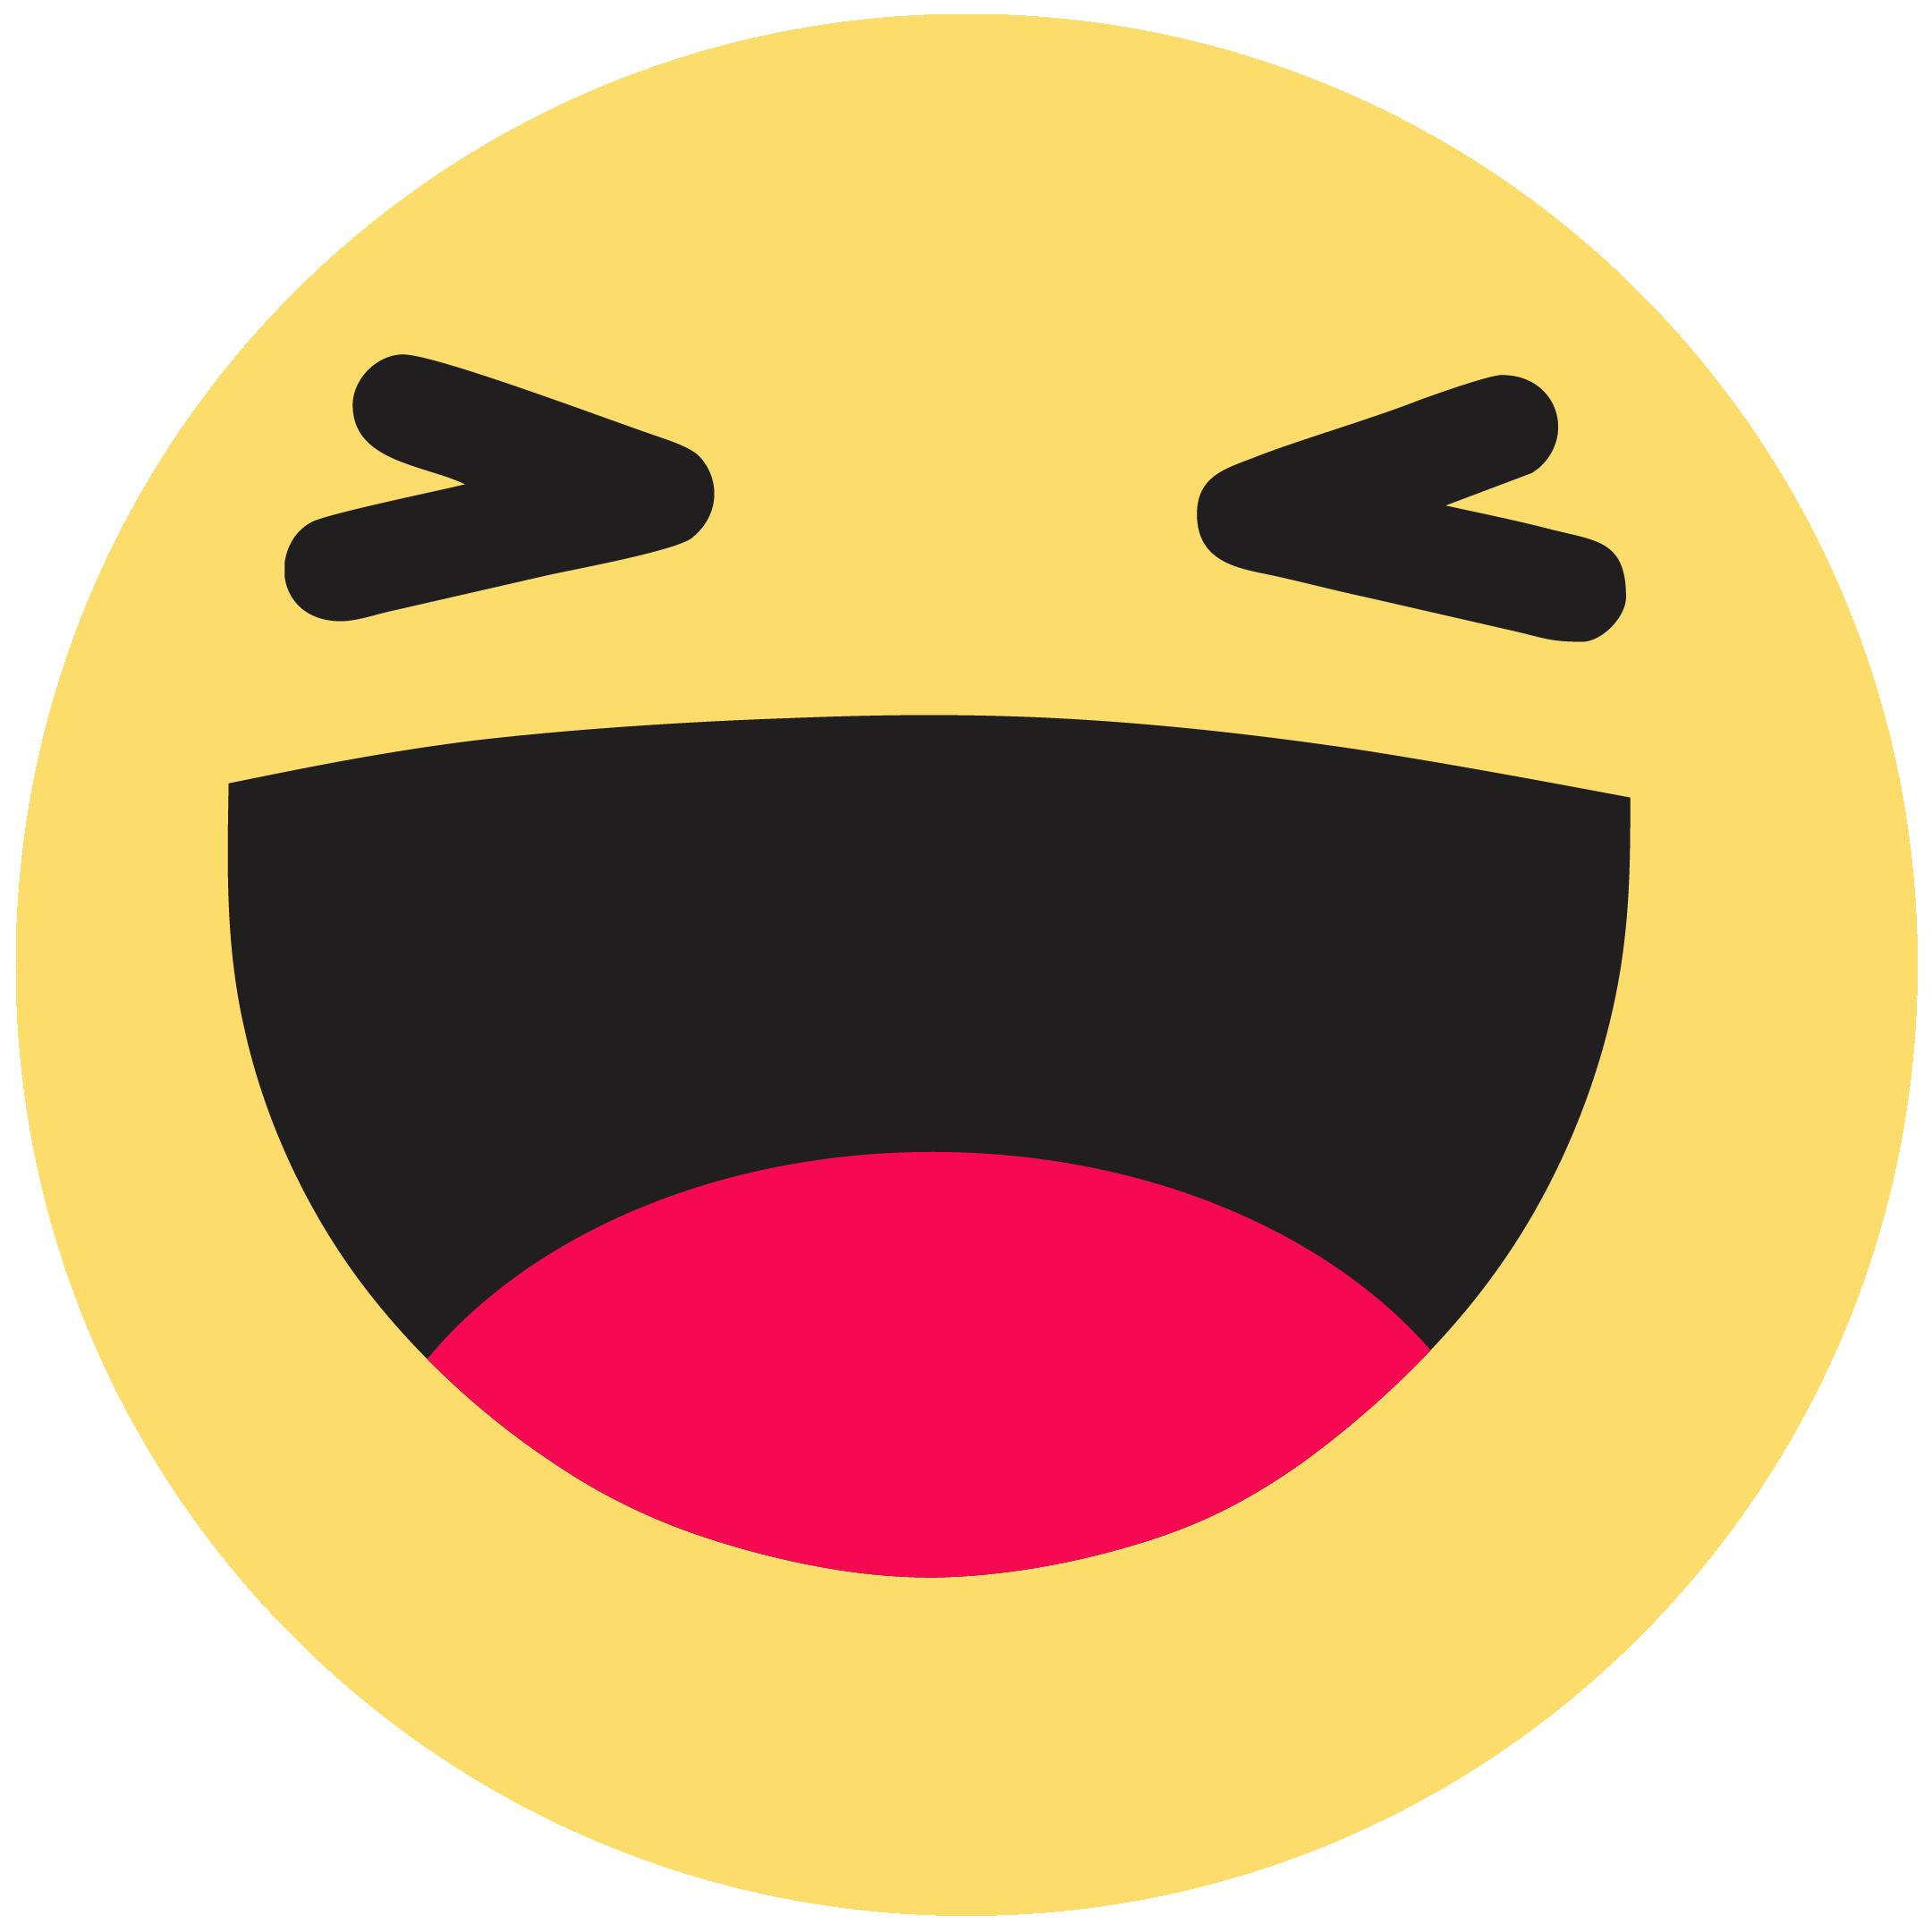 Download Emoticon Like Button Haha Facebook Emoji Hq Png Image Freepngimg